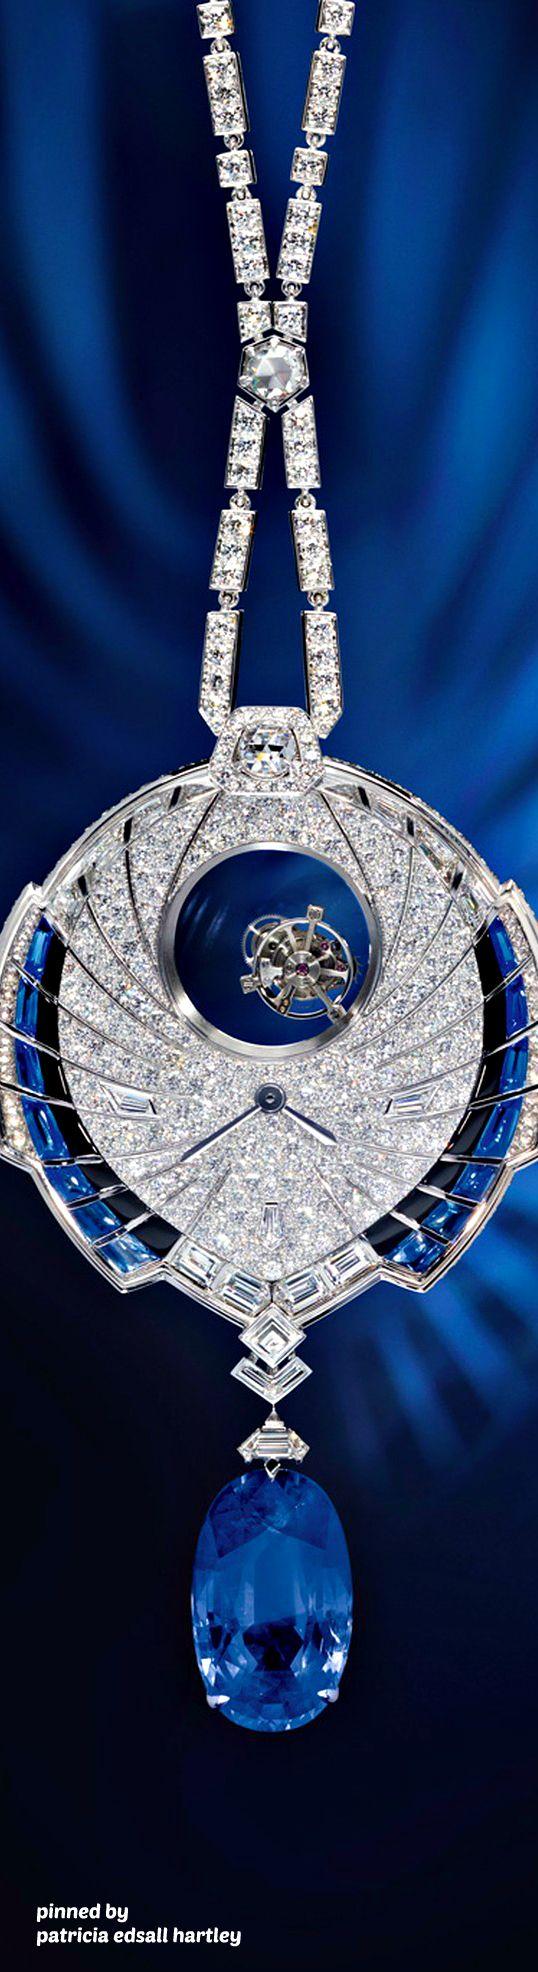 Cartier's pendant watch                                                                                                                                                                                 More